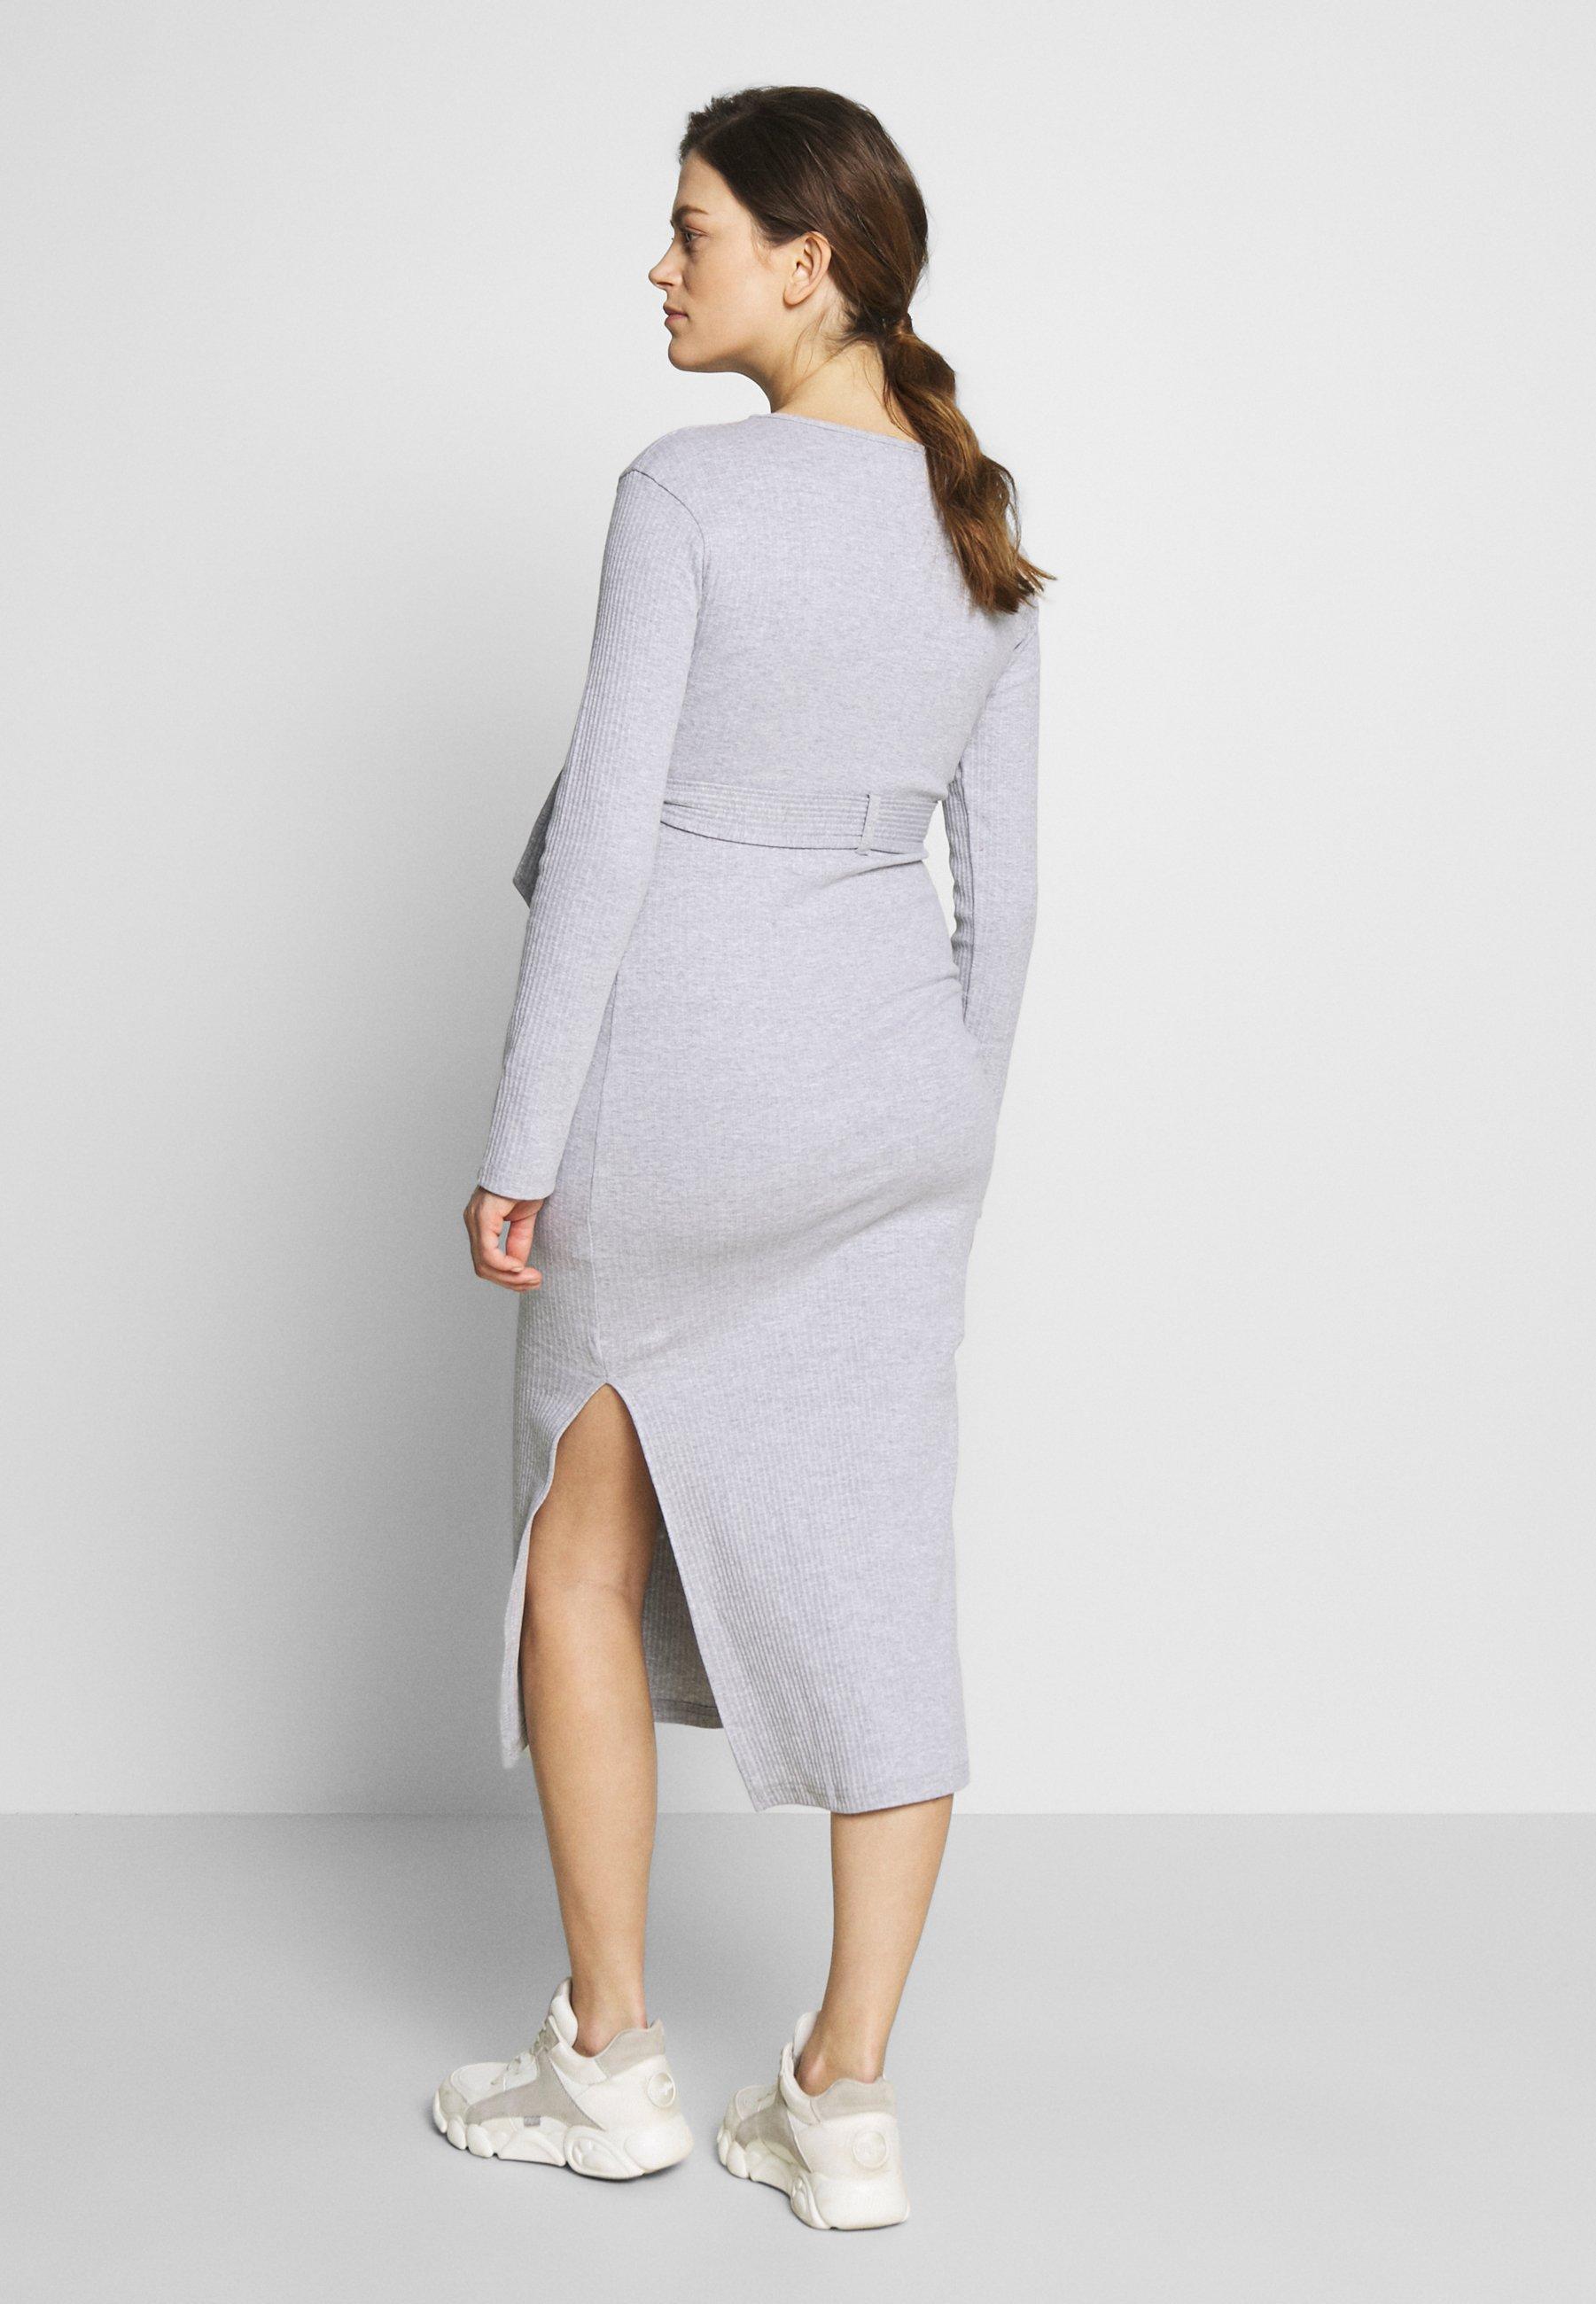 Missguided Maternity SOFT SPLIT SIDE BELTED DRESS Jerseykleid grey/grau